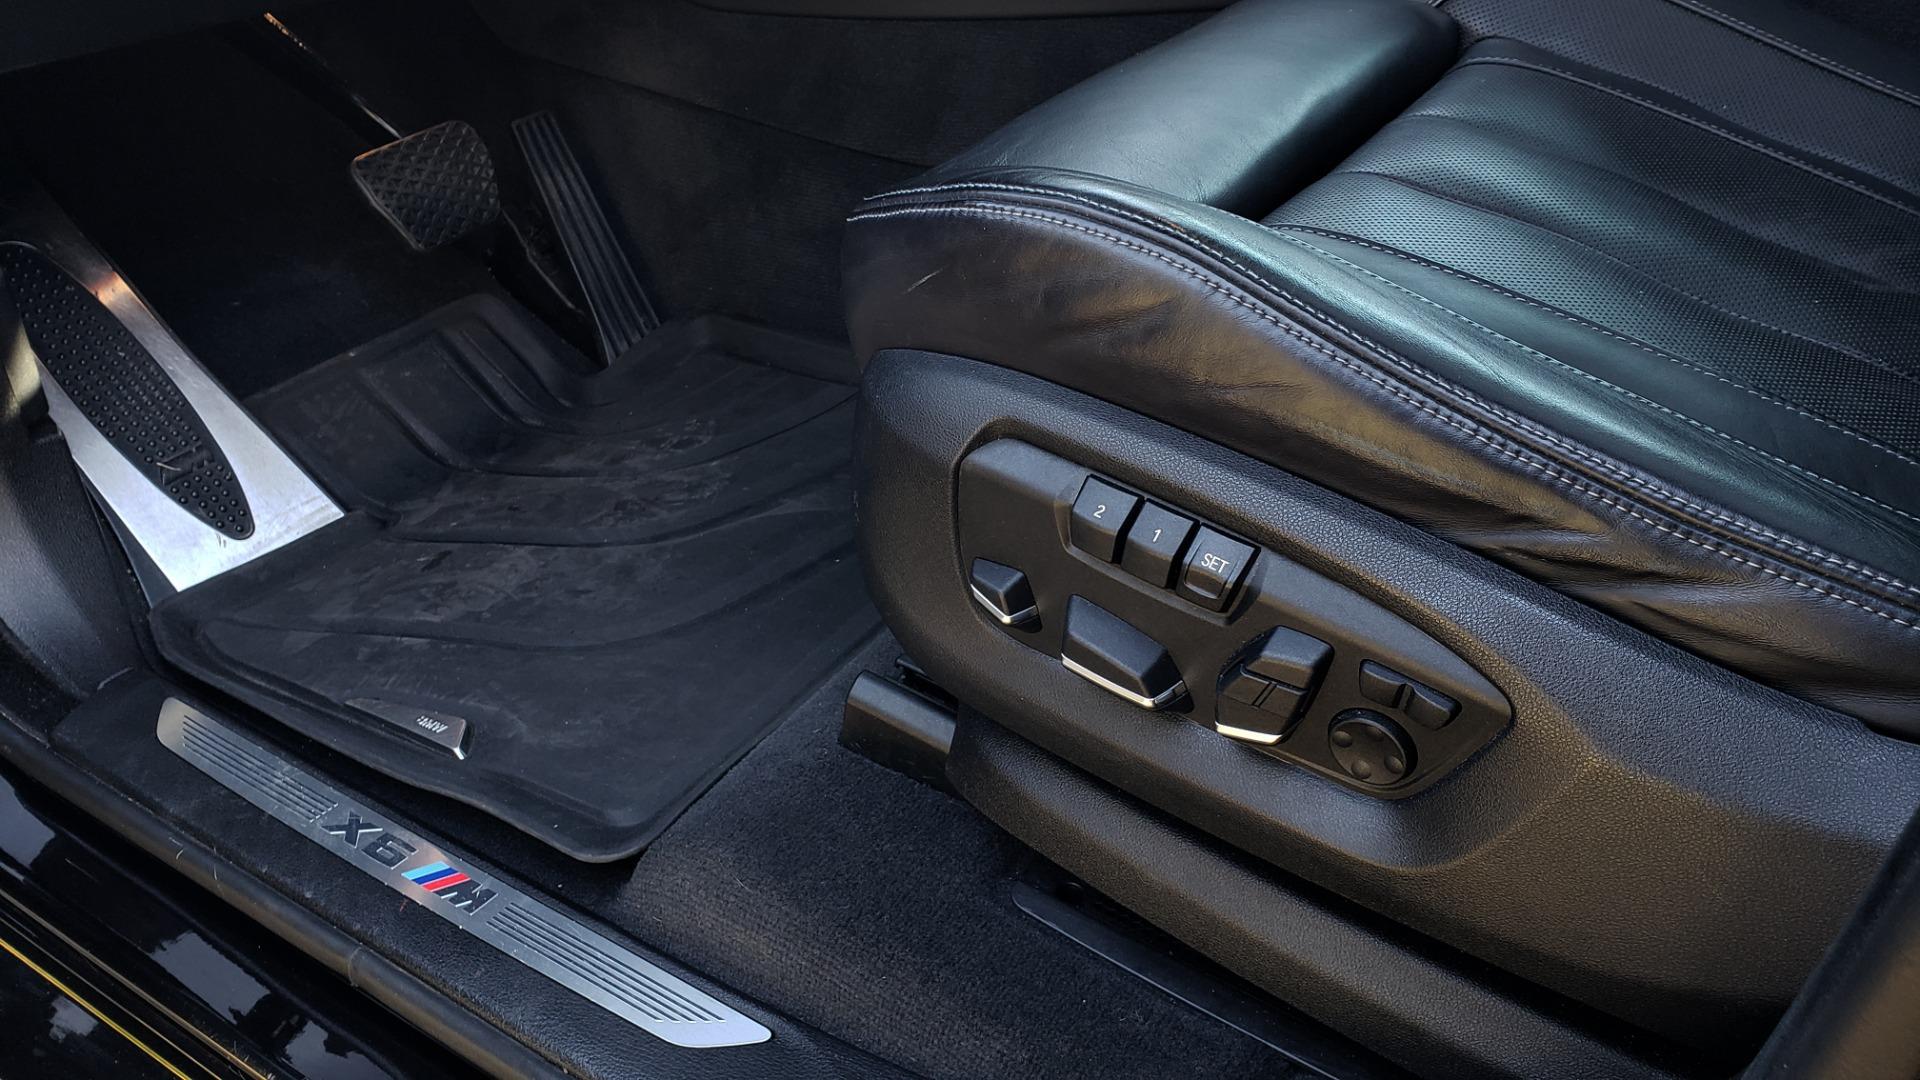 Used 2016 BMW X6 M EXEC PKG / DRVR ASST / NAV / SUNROOF / BLIND SPOT / REARVIEW for sale Sold at Formula Imports in Charlotte NC 28227 34